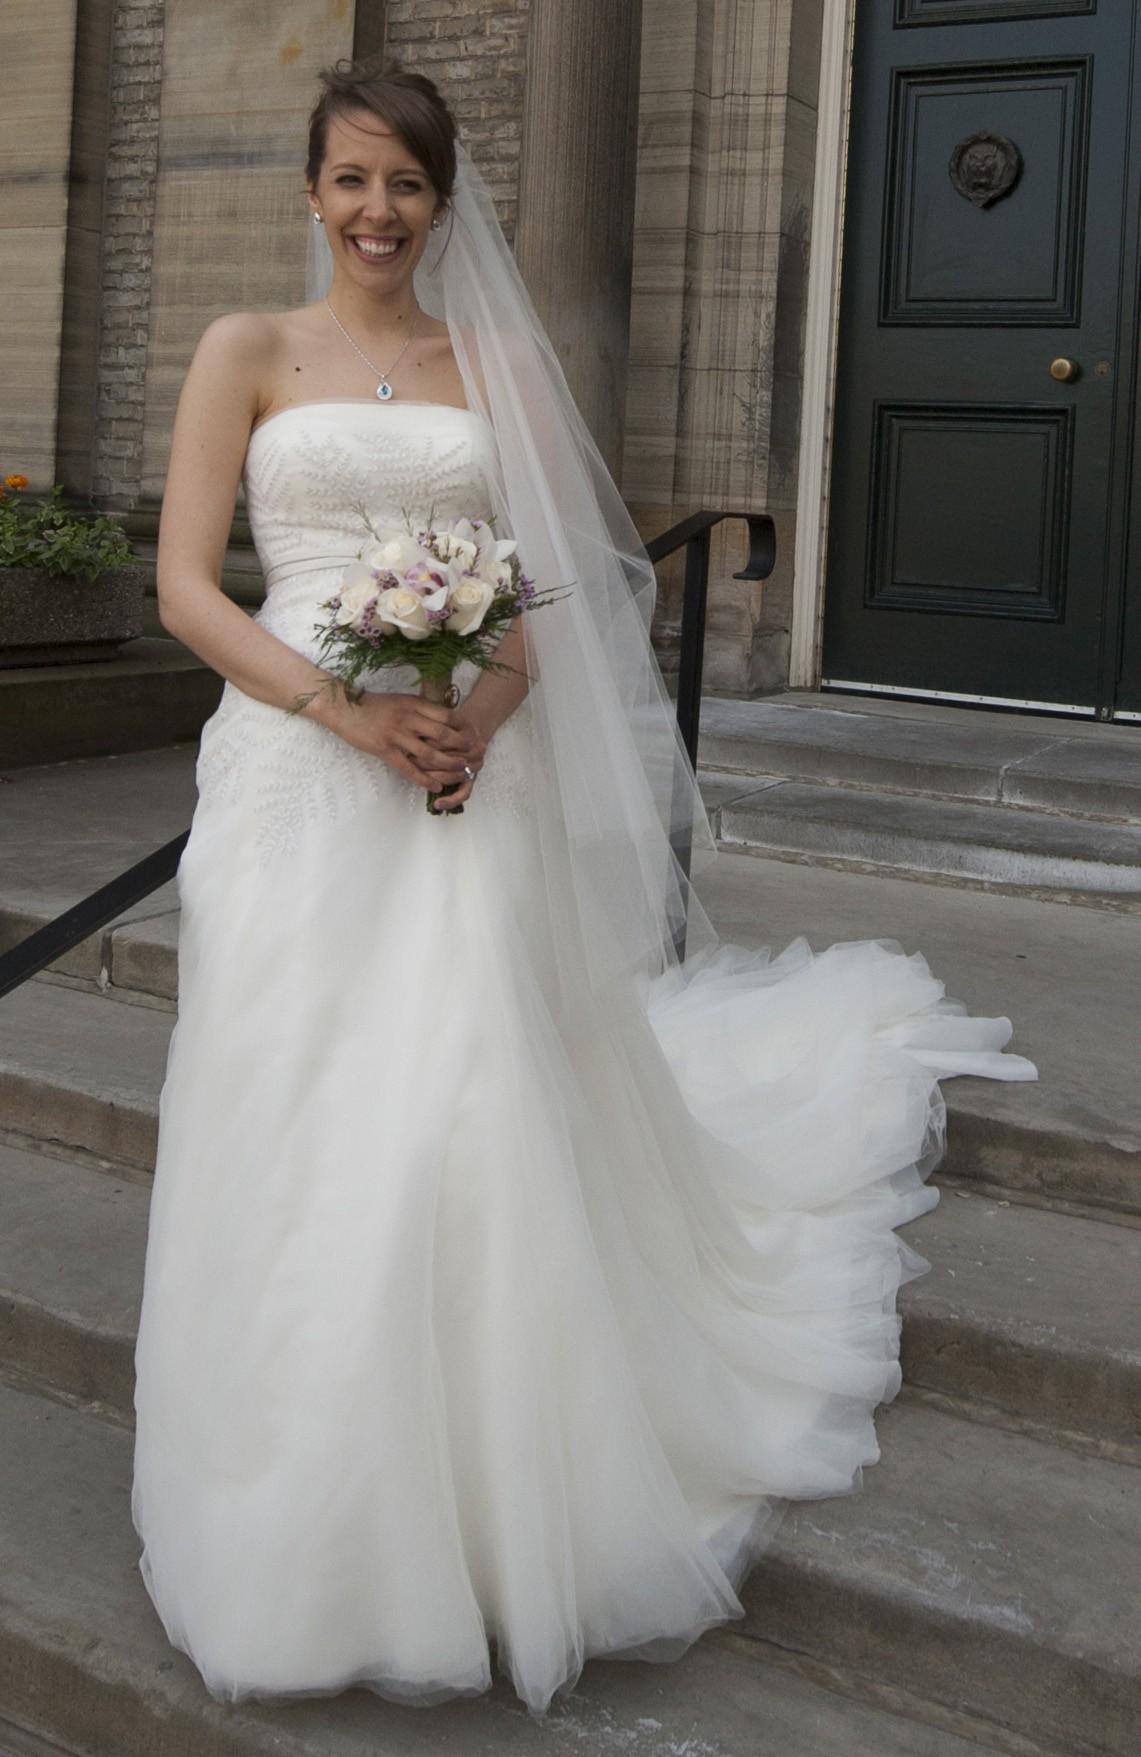 Vera wang second hand wedding dress on sale 50 off for Second hand vera wang wedding dress